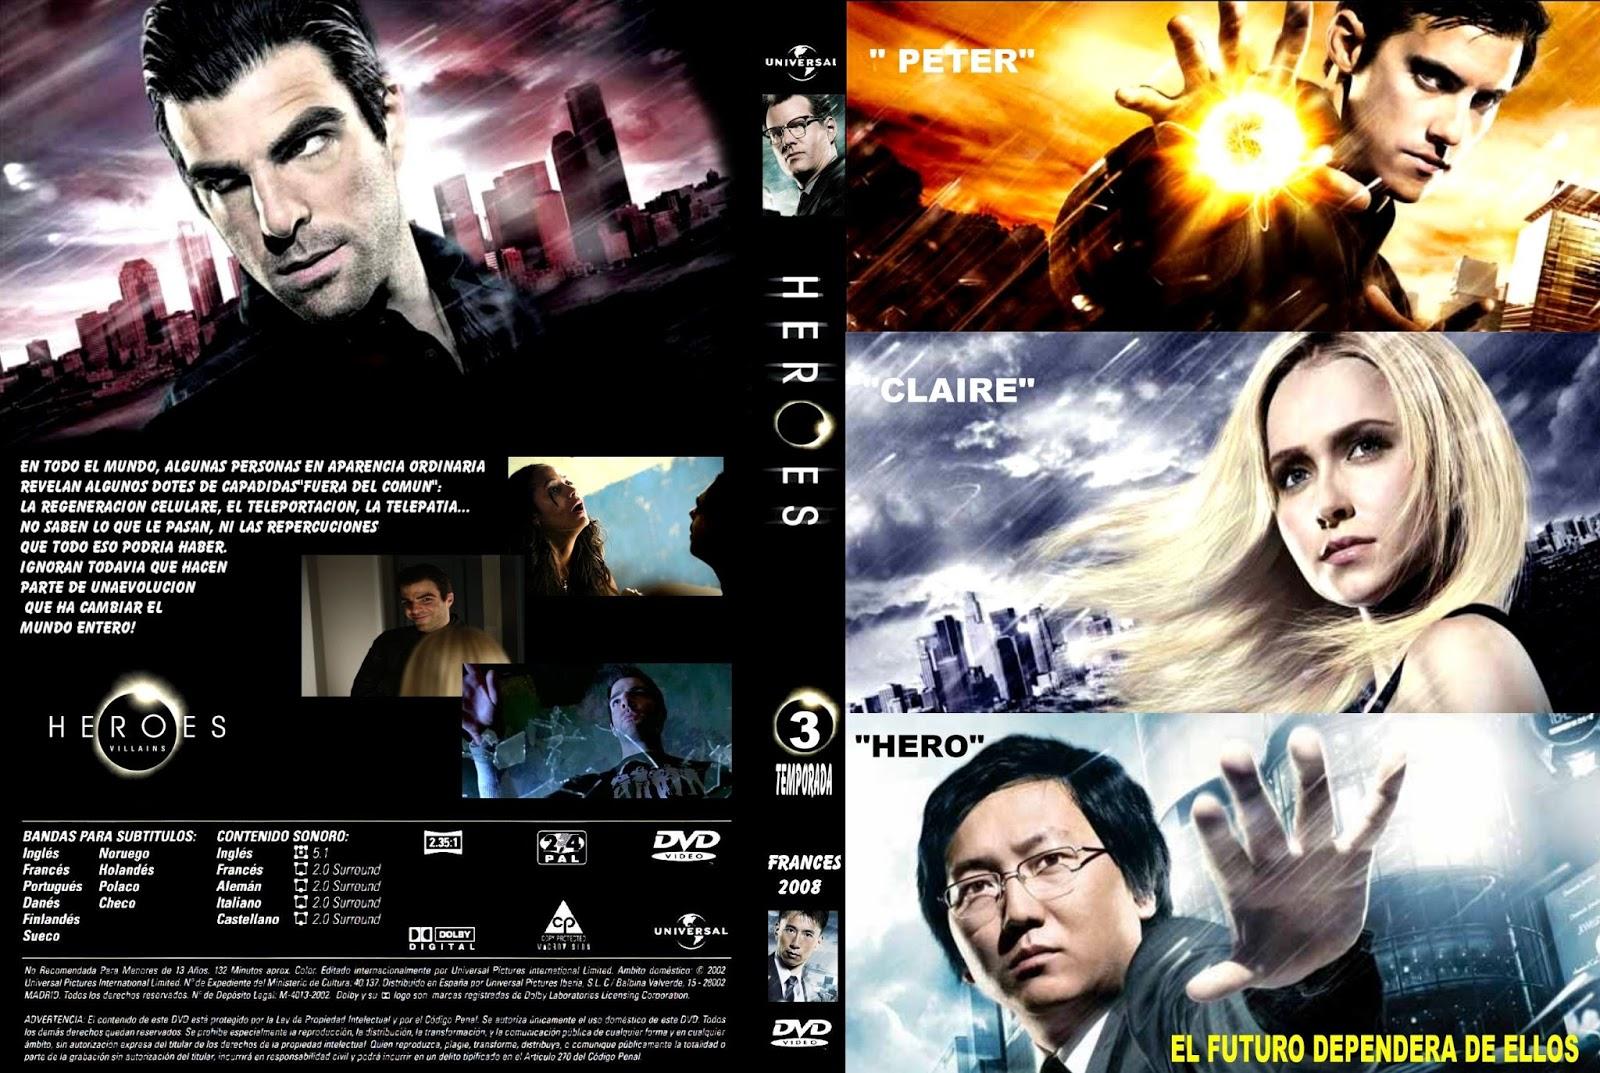 Heroes (Temporada 3) (DVD 01/06) (DVD COVER) - COVERGOODPELIS